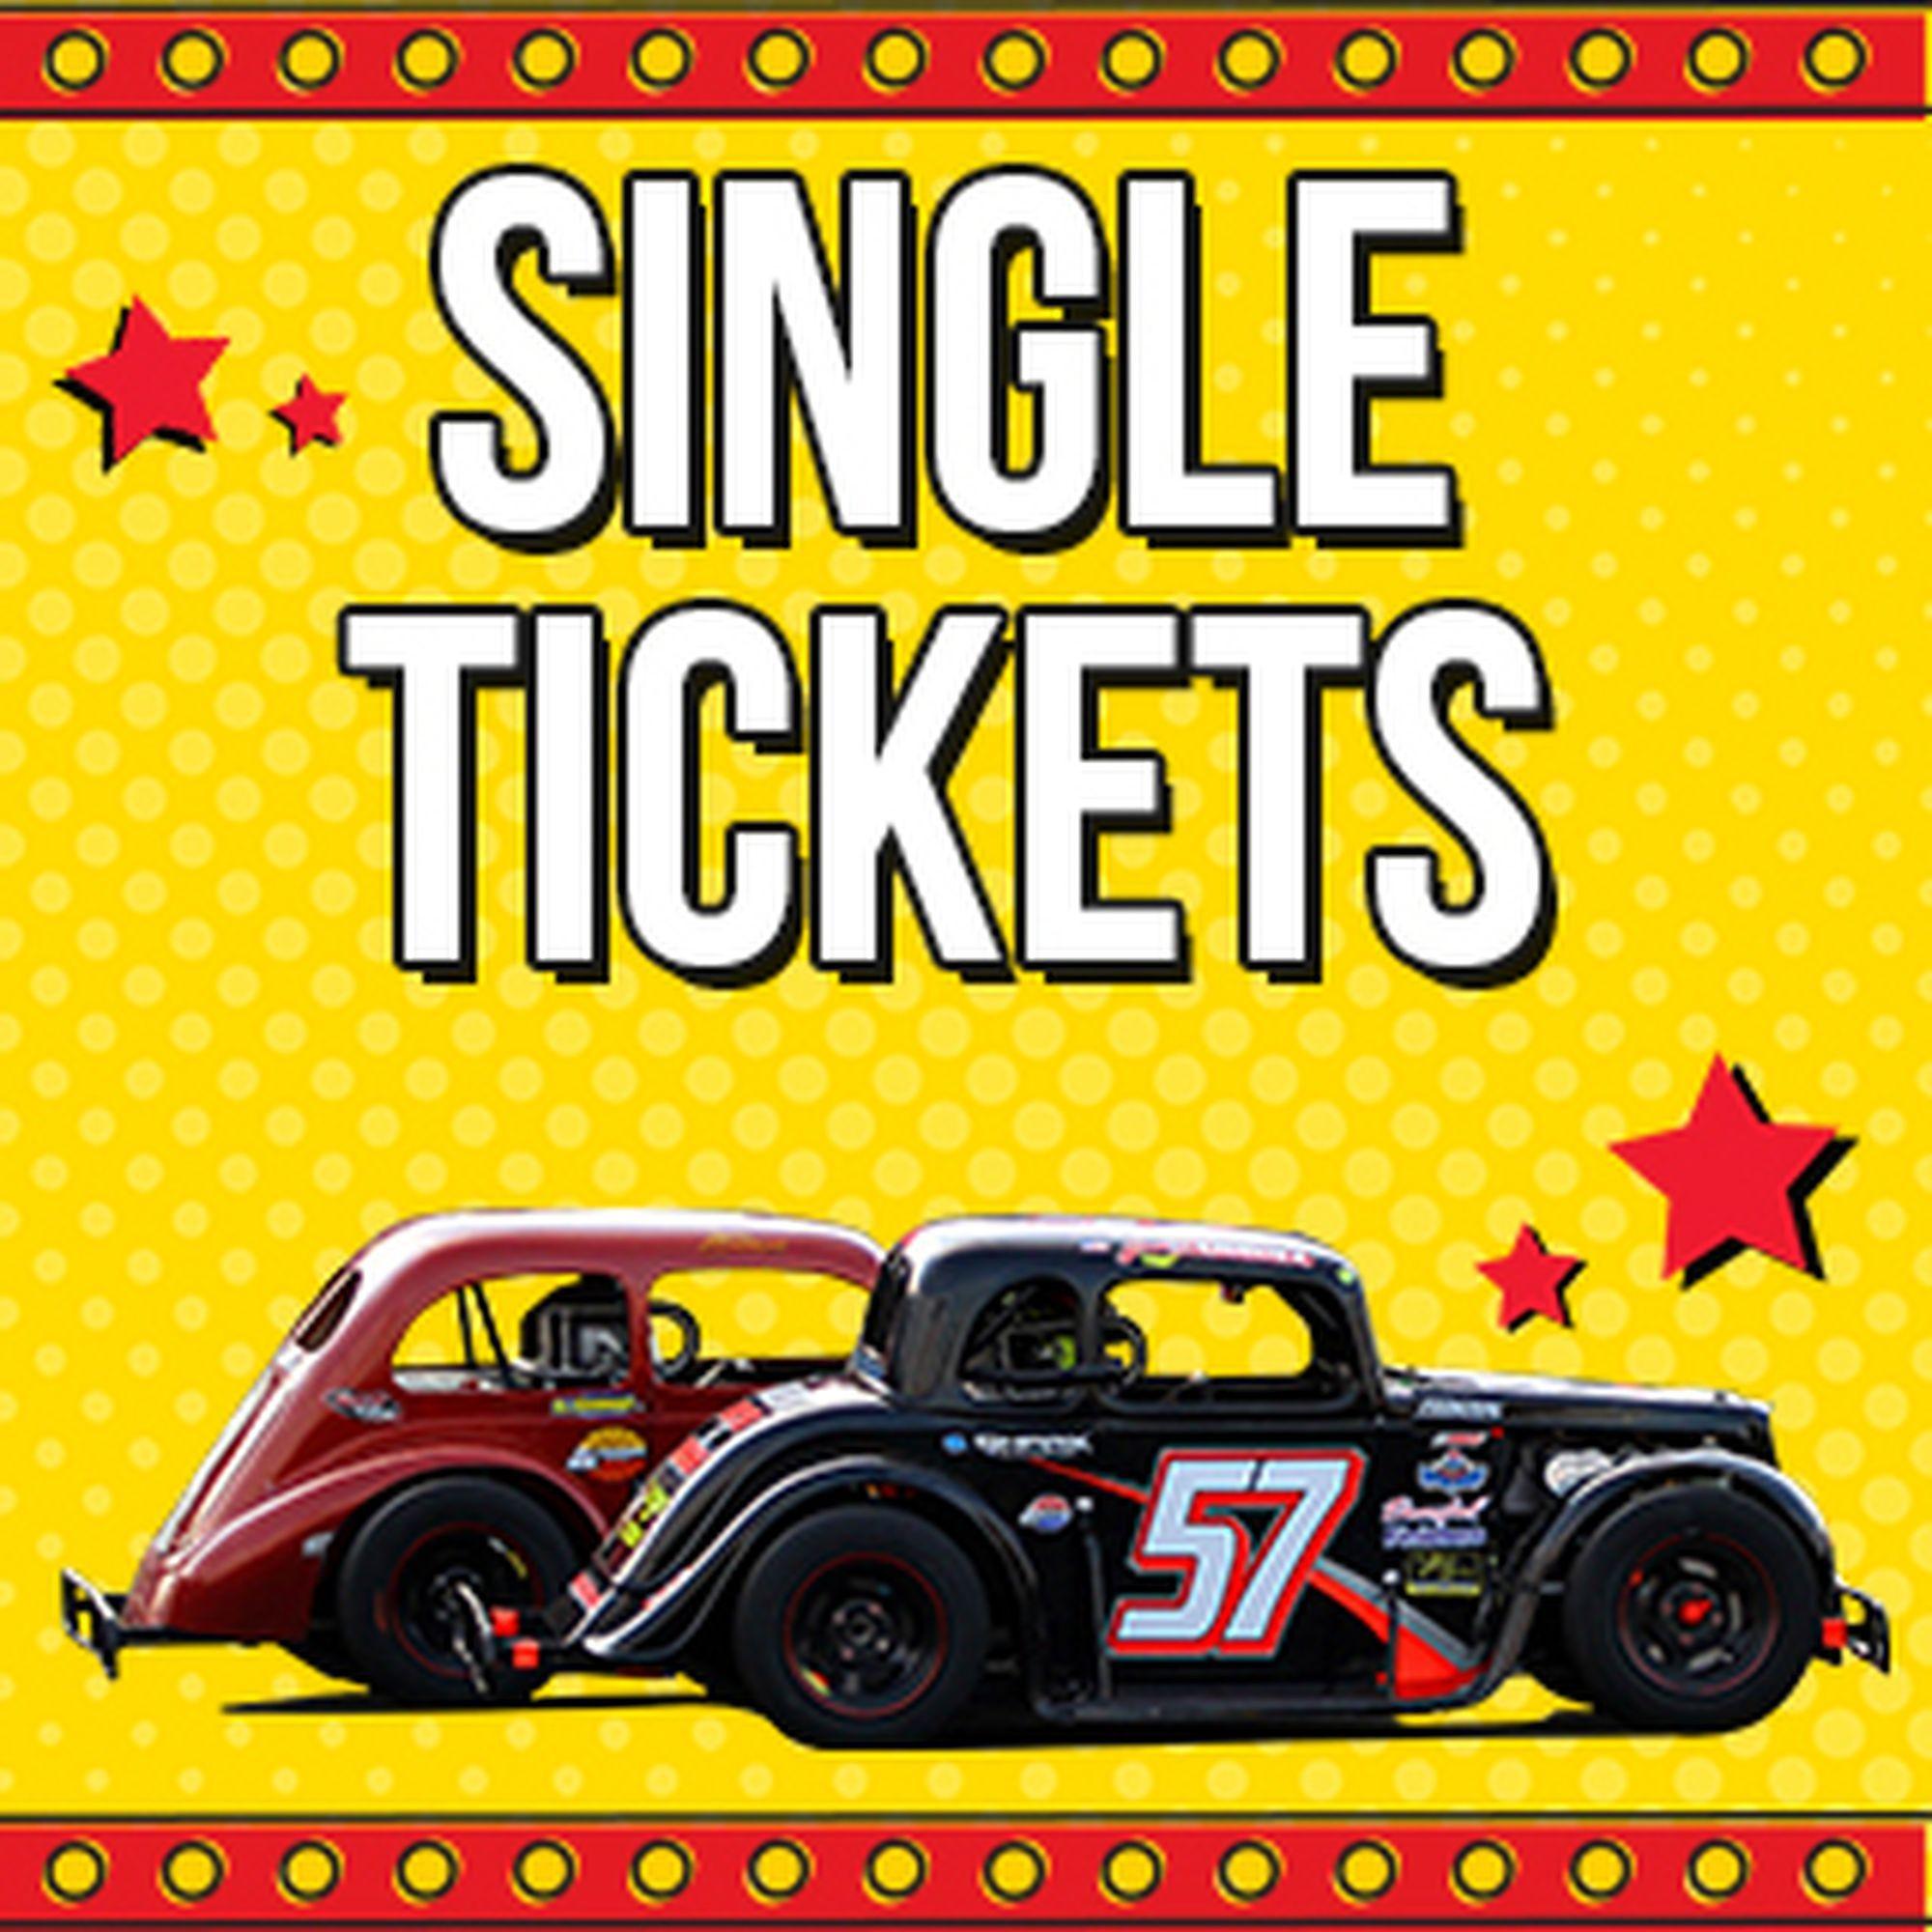 Bojangles Summer Shootout Tickets Events Charlotte